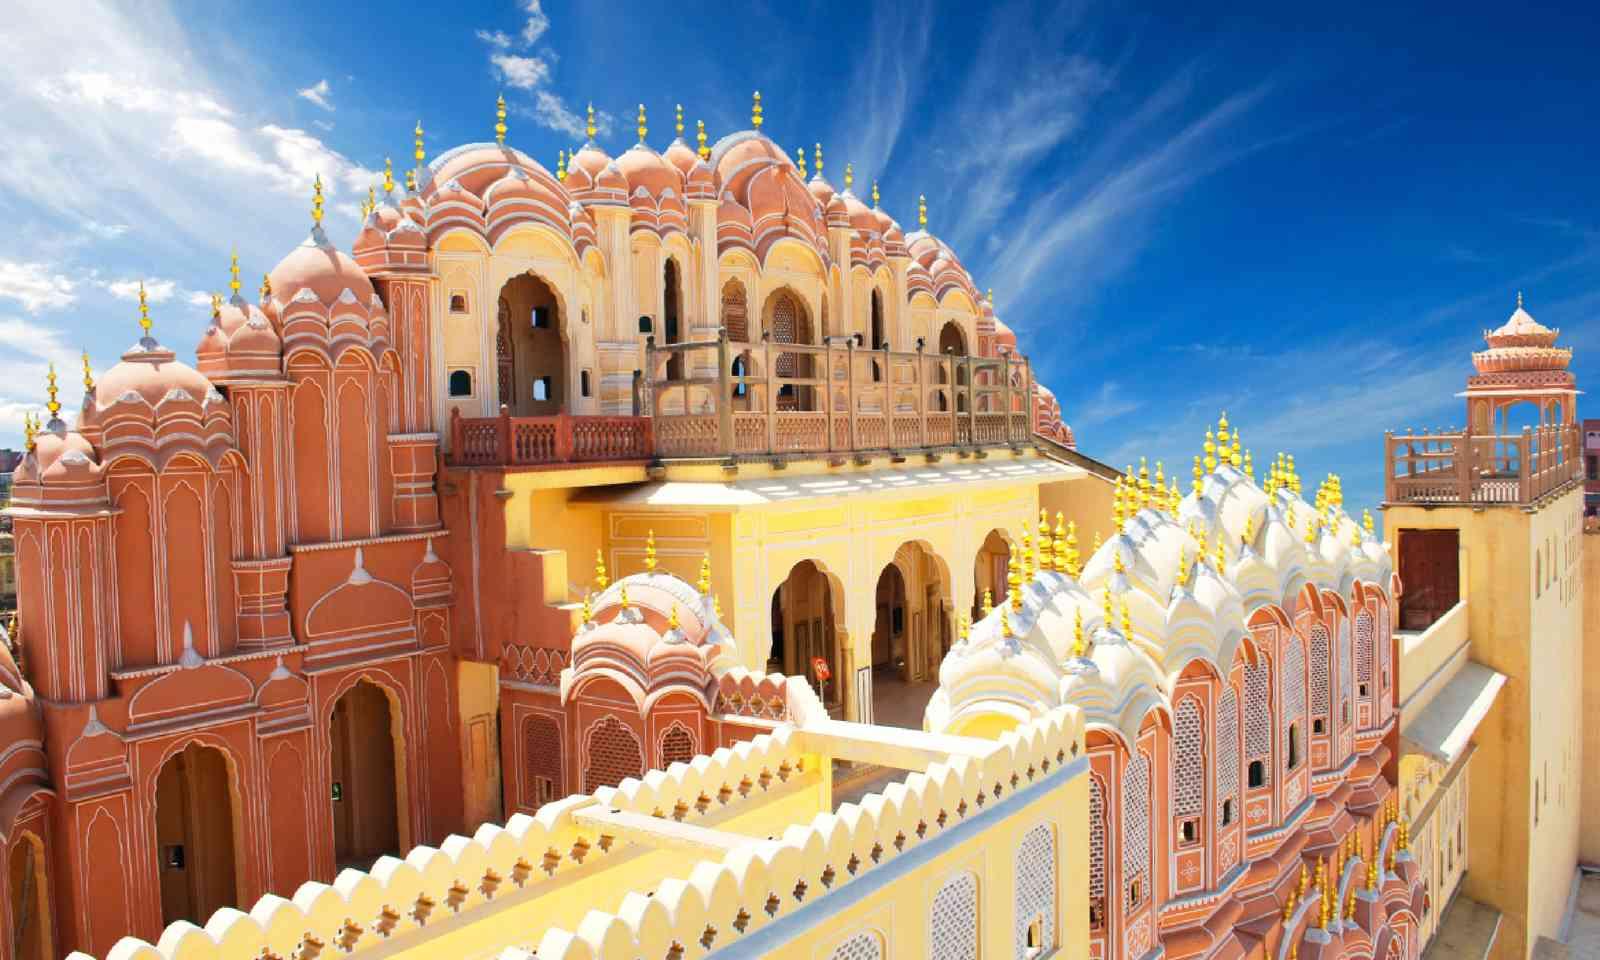 Hawa Mahal, the Palace of Winds, Jaipur (Shutterstock)